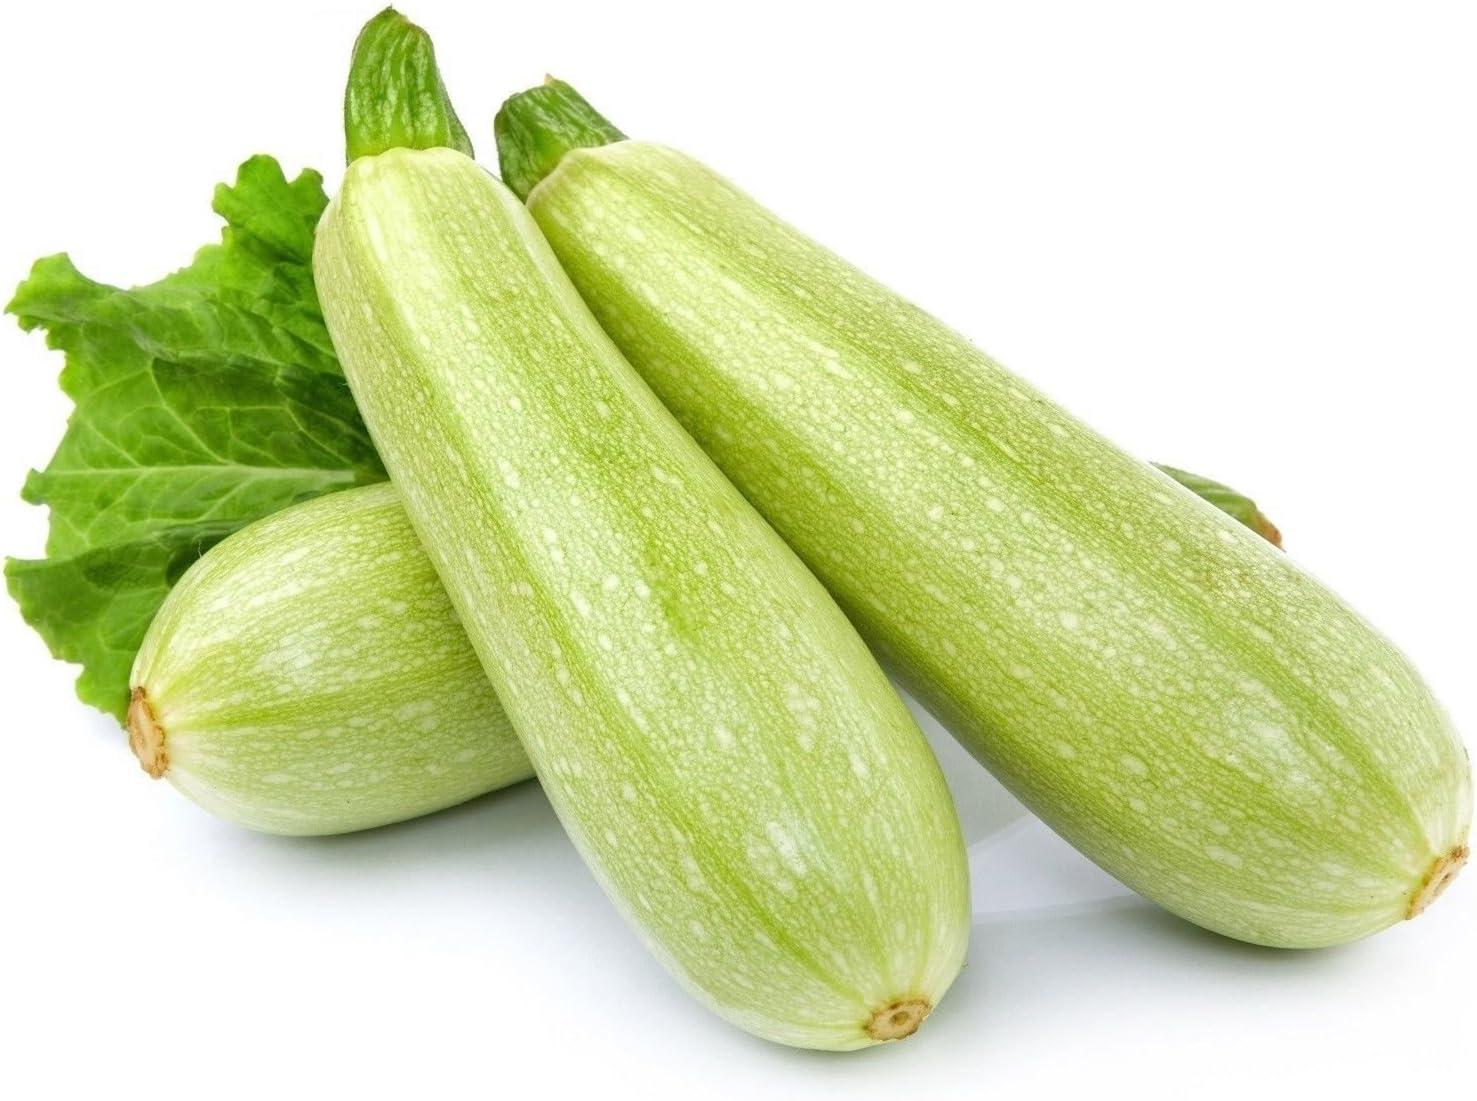 Squash Winter Spaghetti Non GMO Heirloom Garden Vegetable Seeds Sow No GMO\u00ae USA